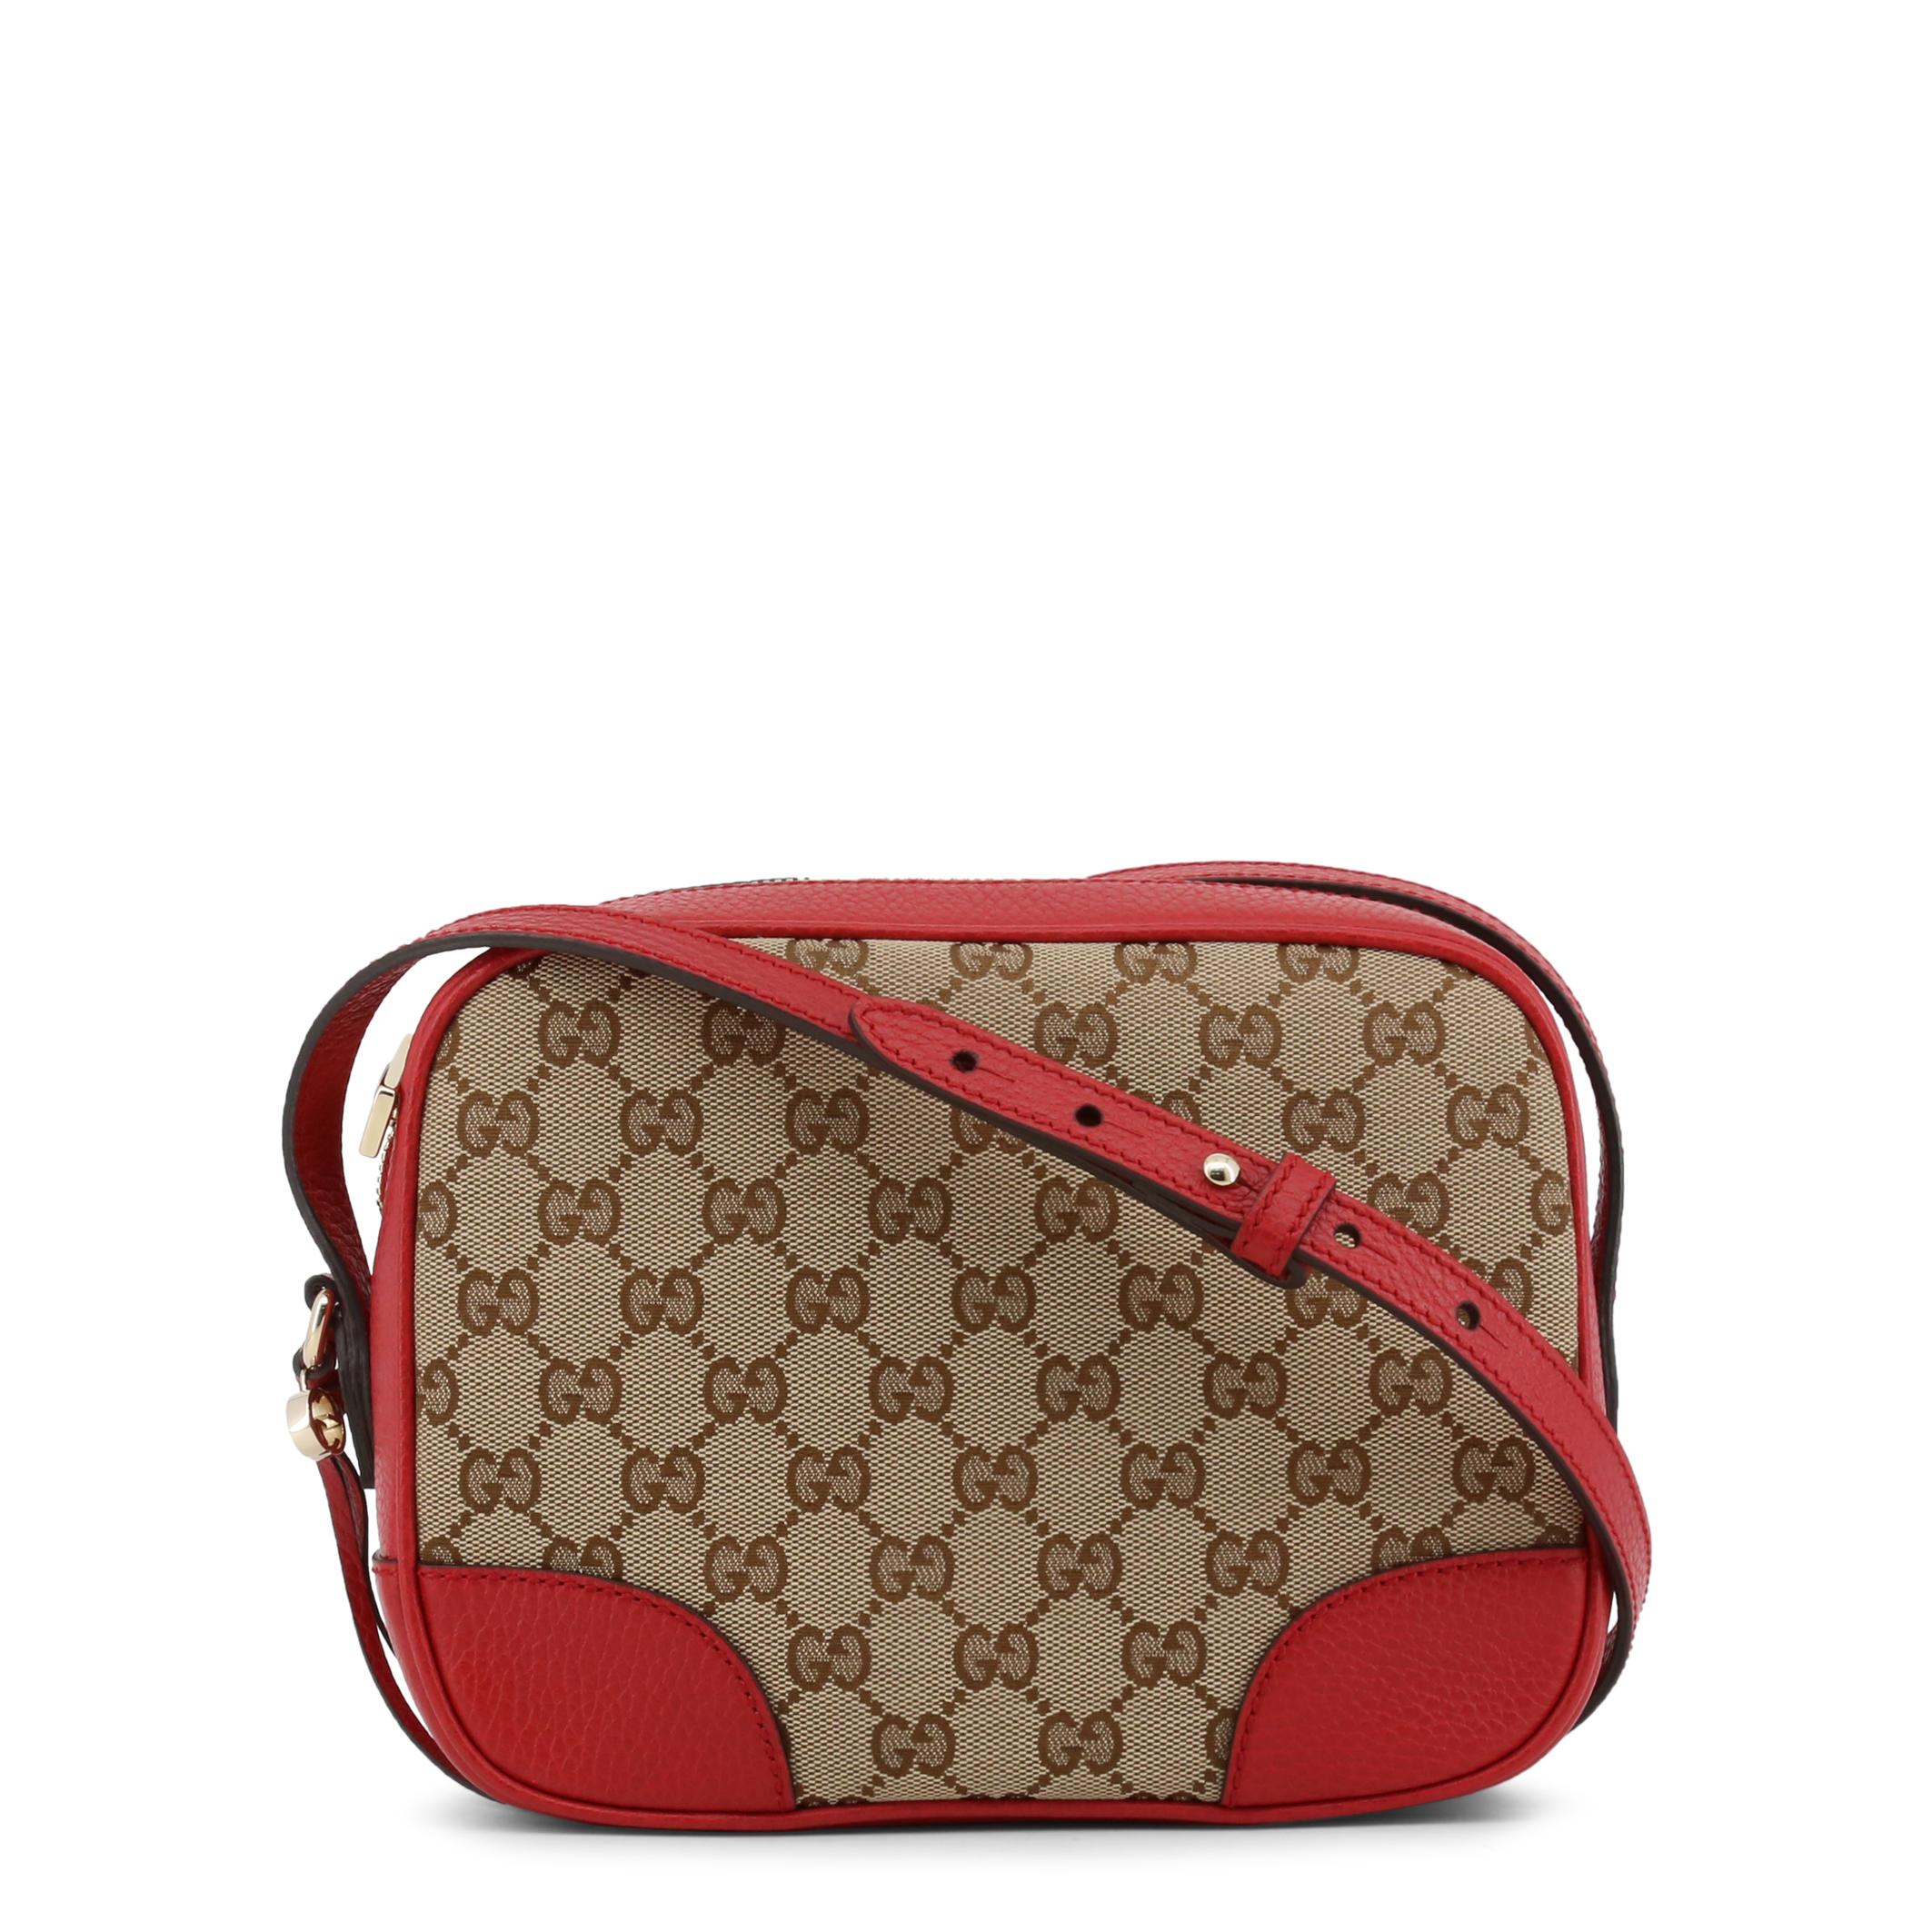 Gucci 449413 KY9LG